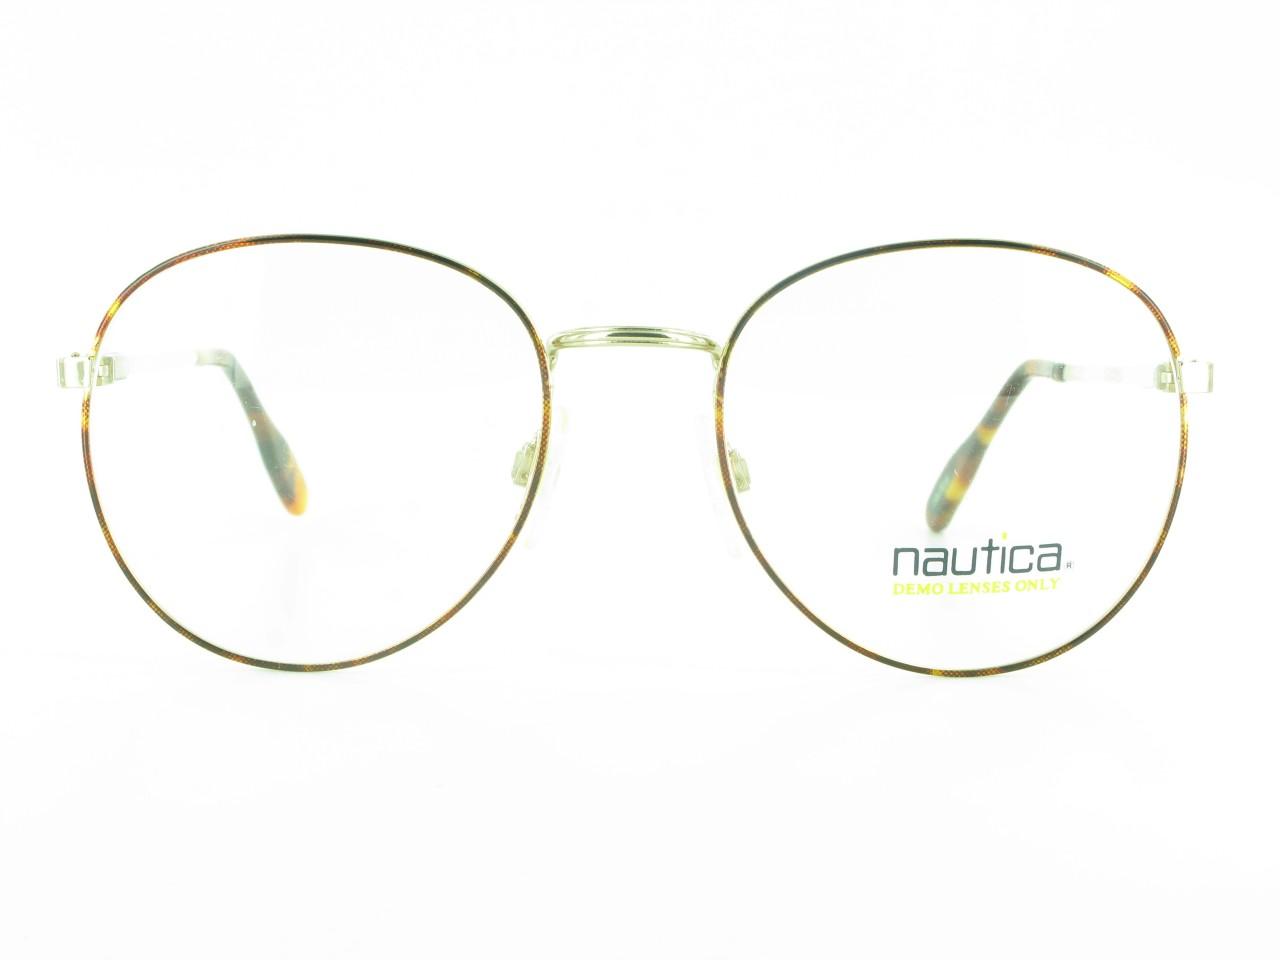 Large Round NAUTICA J6 EYEGLASSES Mens or Womens Designer ...